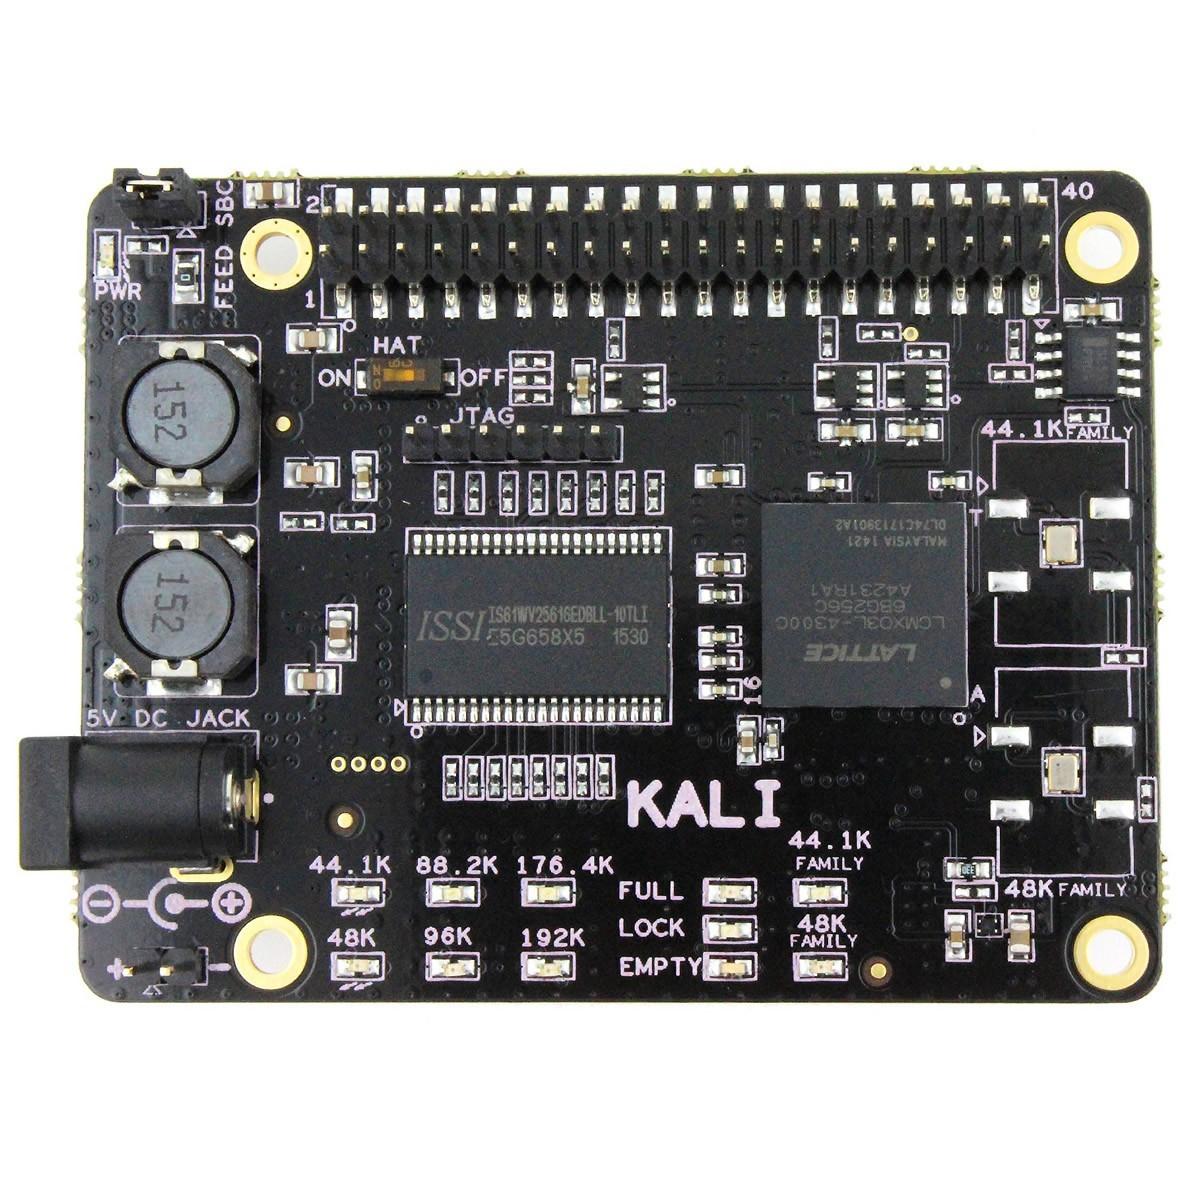 ALLO KALI Reclocker I2S FIFO Sparky SBC and Raspberry 44/48MHz 384kHZ